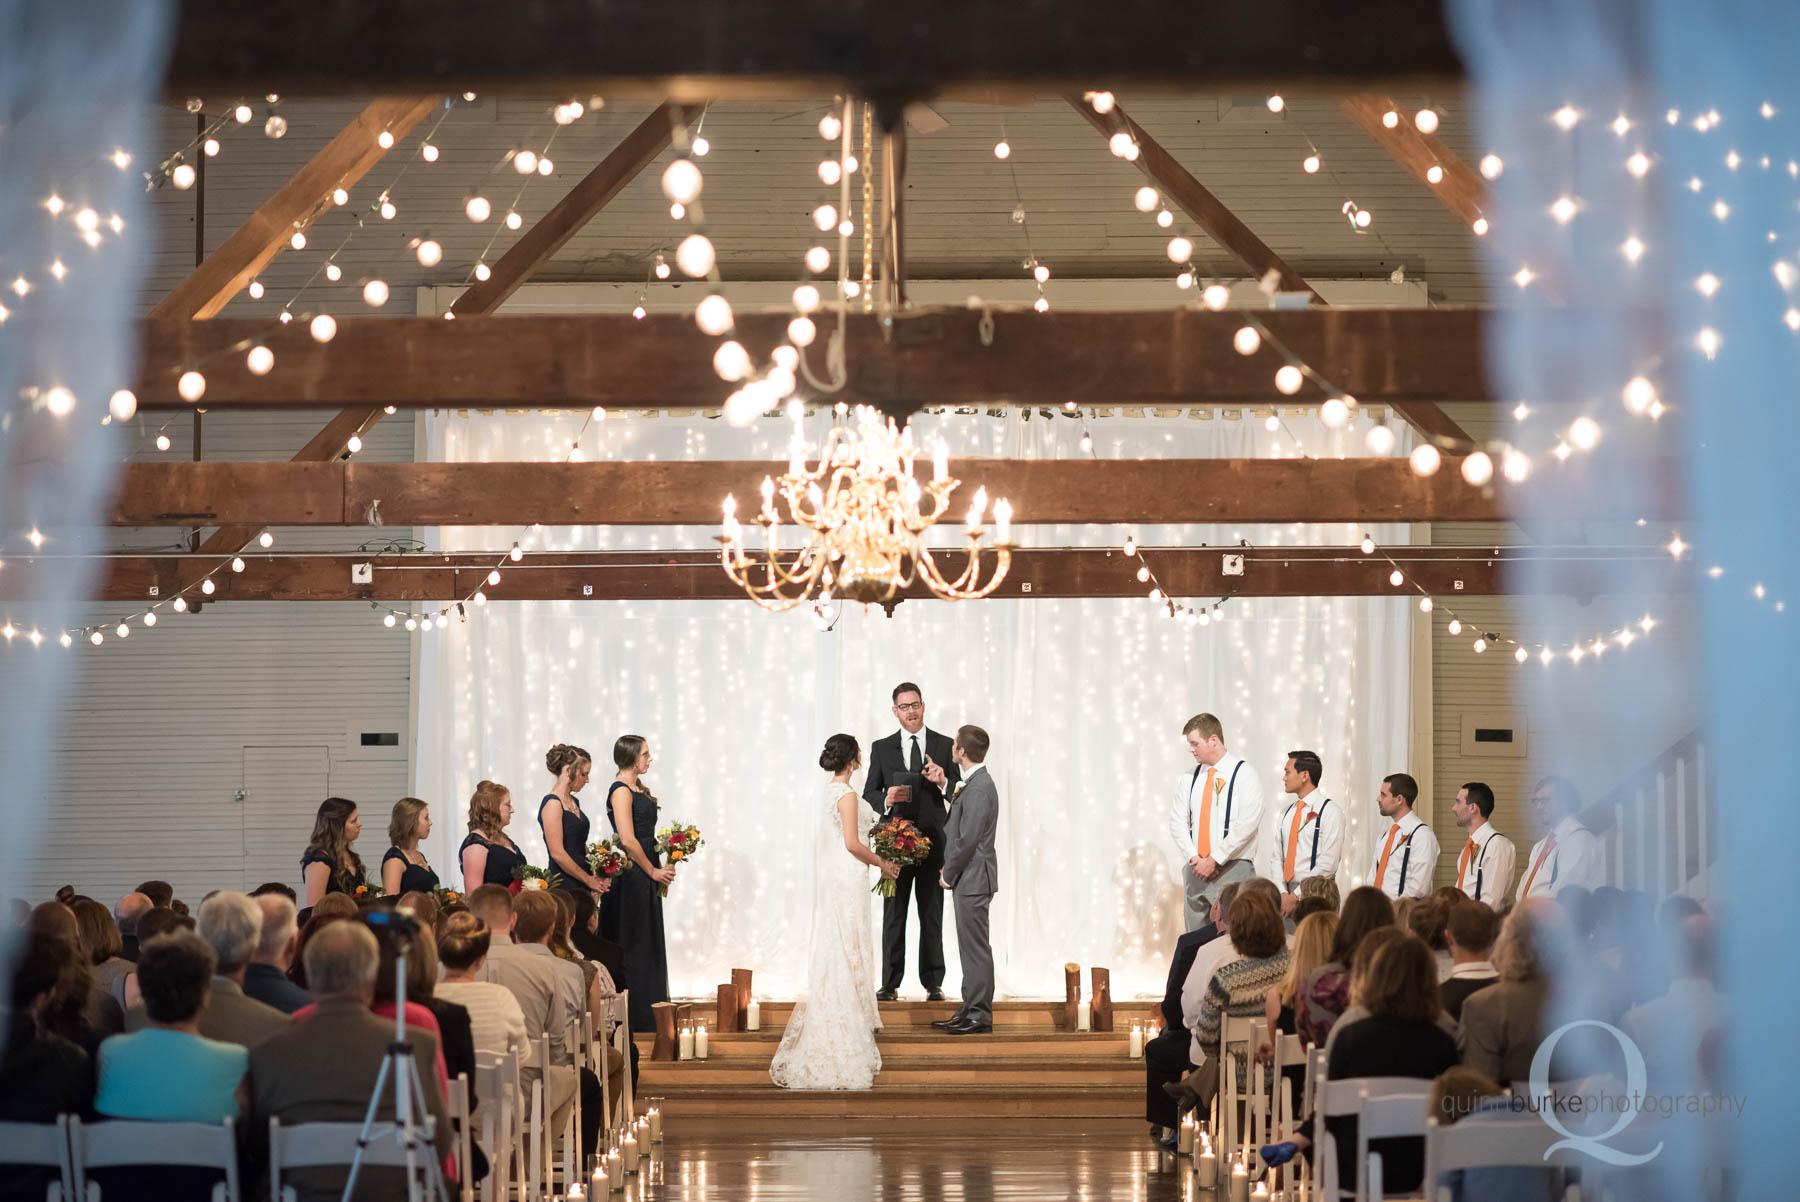 Green Villa Barn wedding ceremony in barn